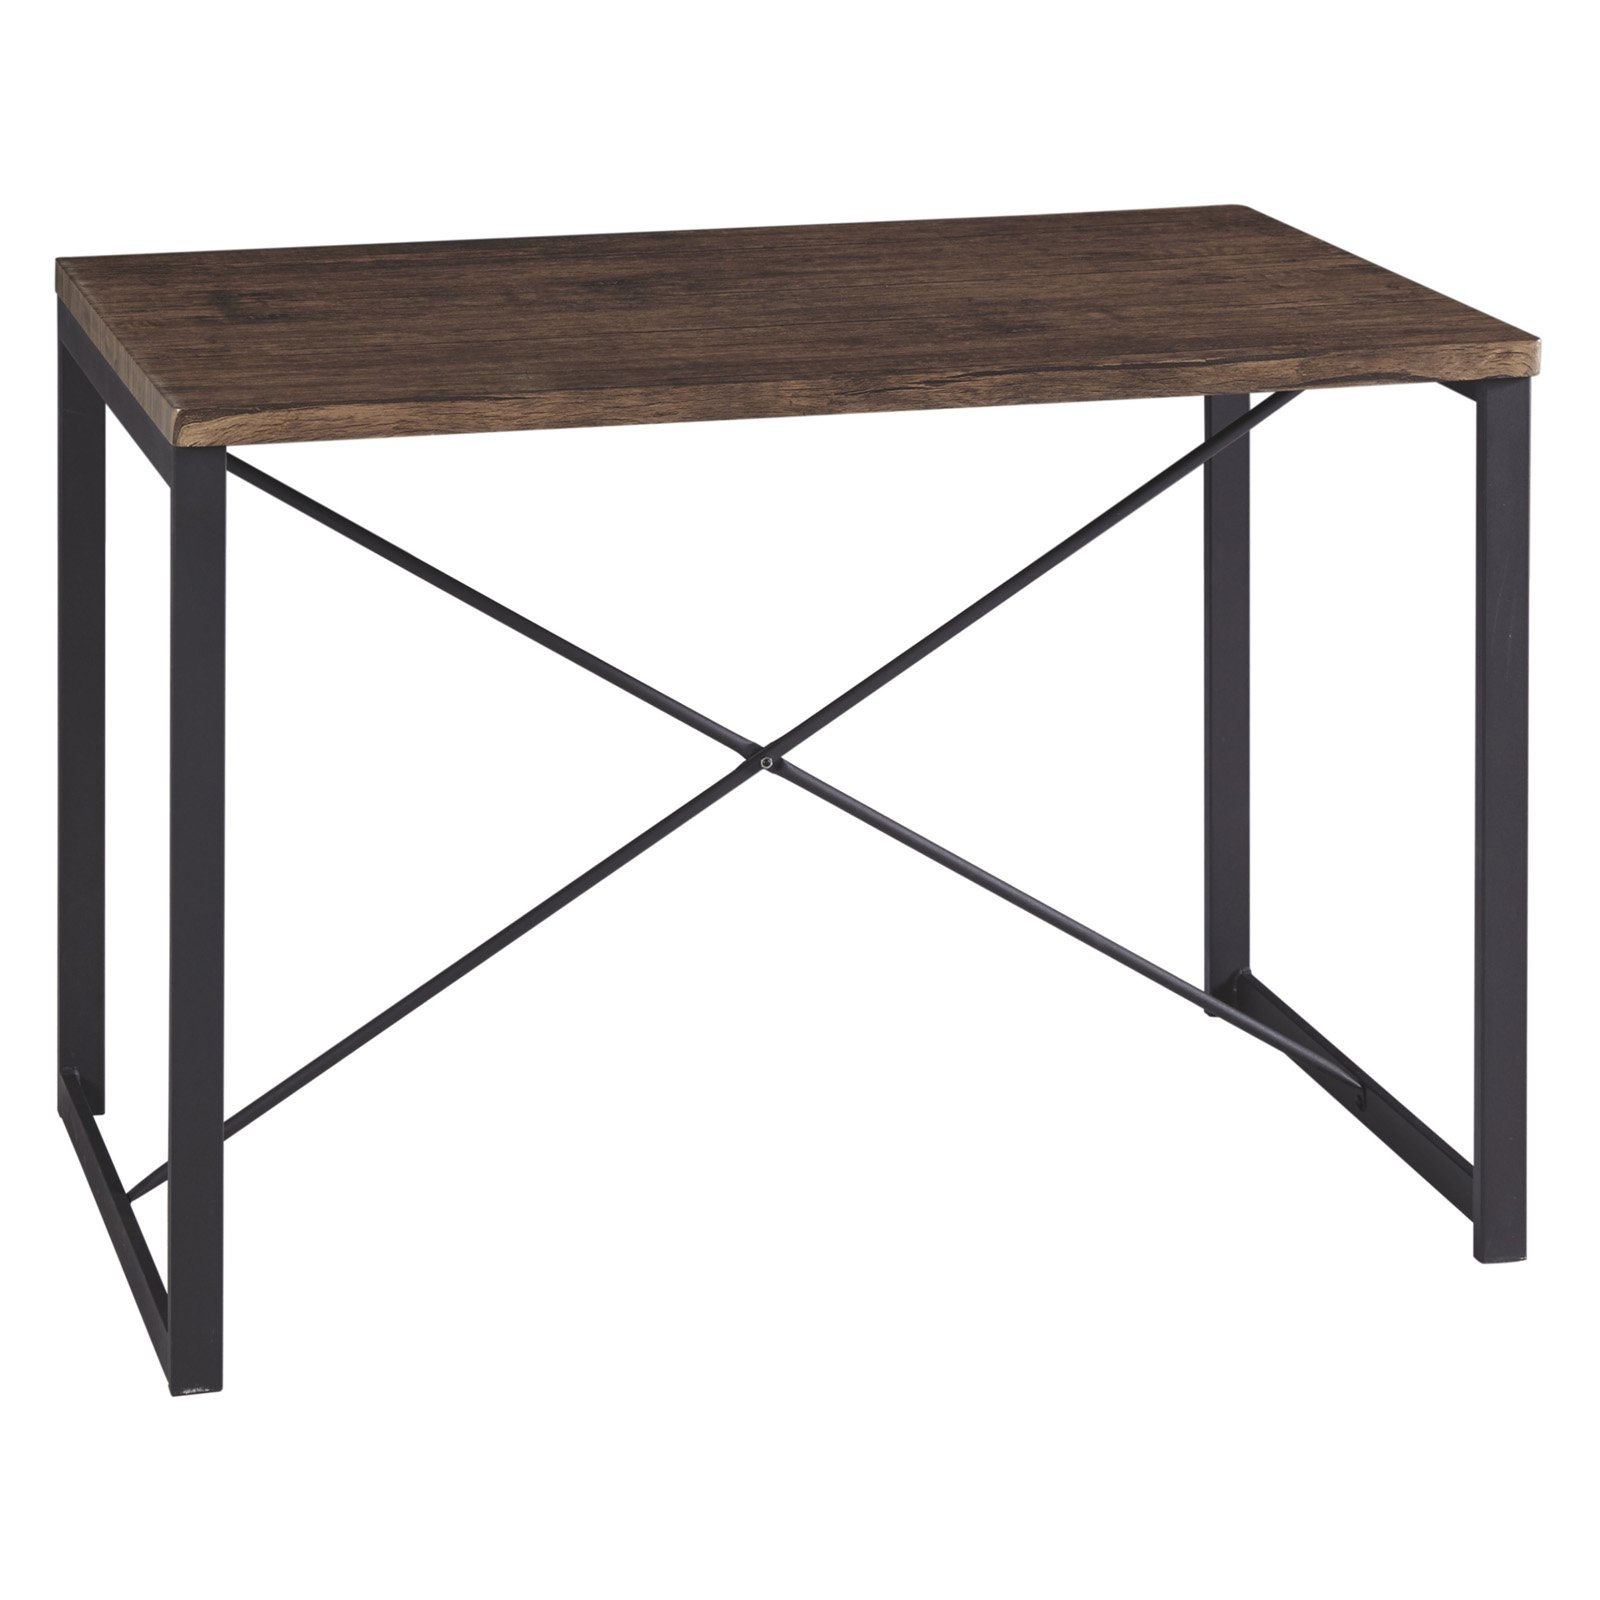 Signature Design by Ashley Samcott Rectangular Dining Table